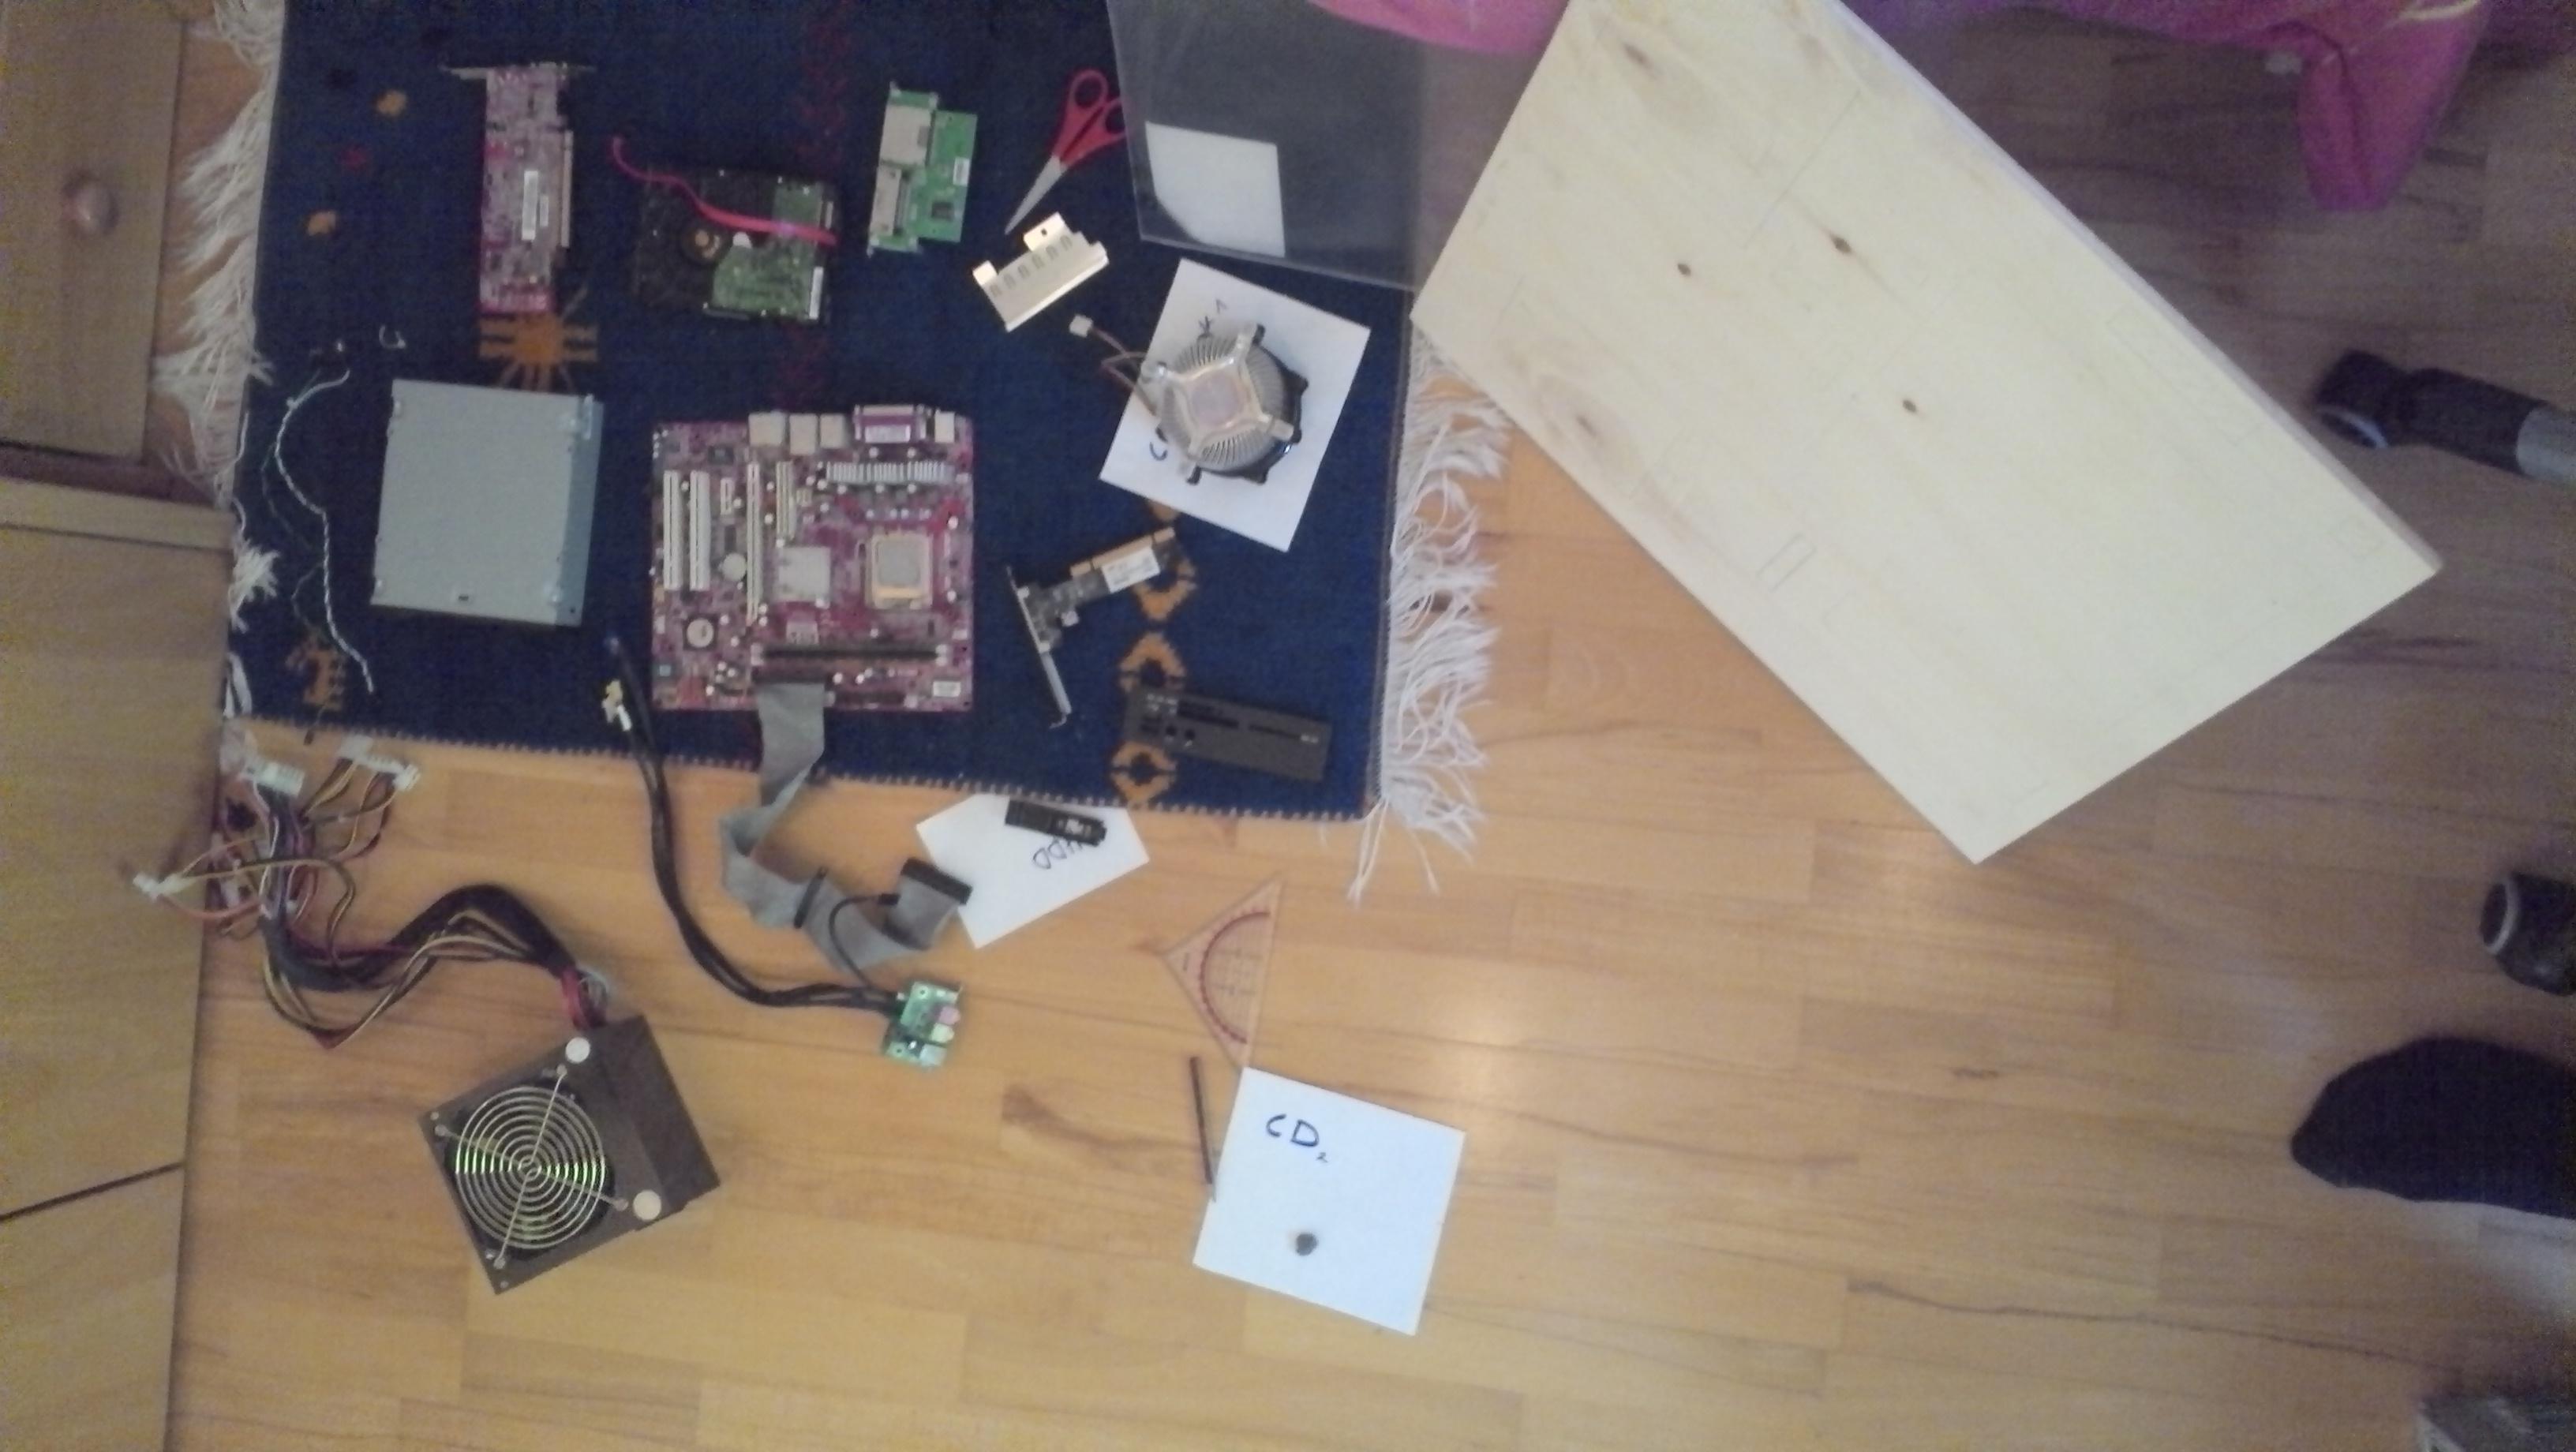 wall mounted pc ein schmuckst ck an der wand finished. Black Bedroom Furniture Sets. Home Design Ideas